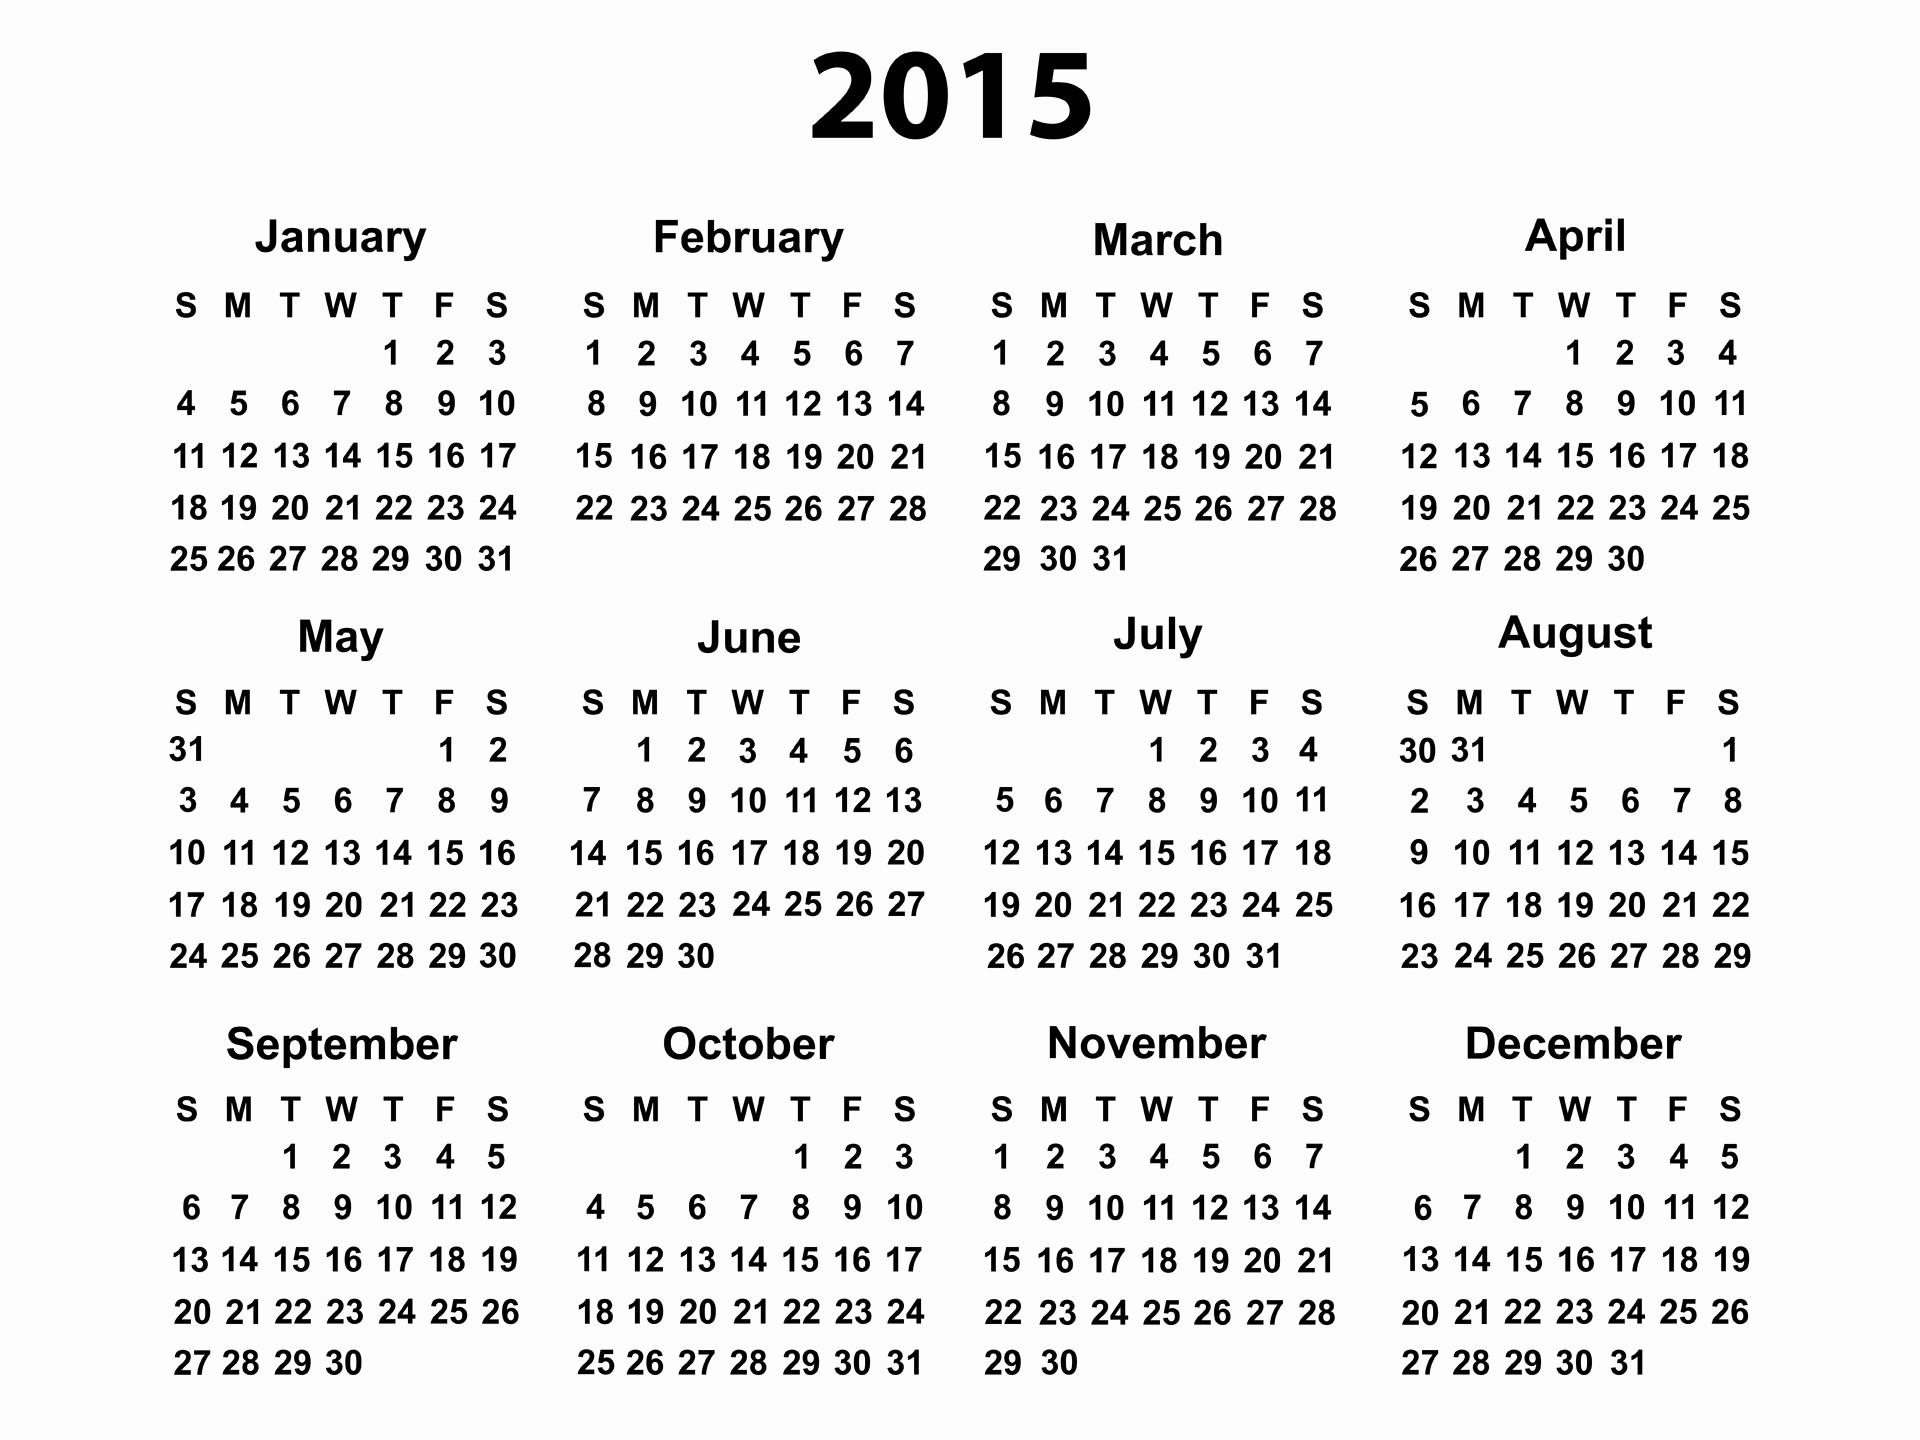 Calendar Of events Template 2015 Fresh 2015 Calendar Templates &